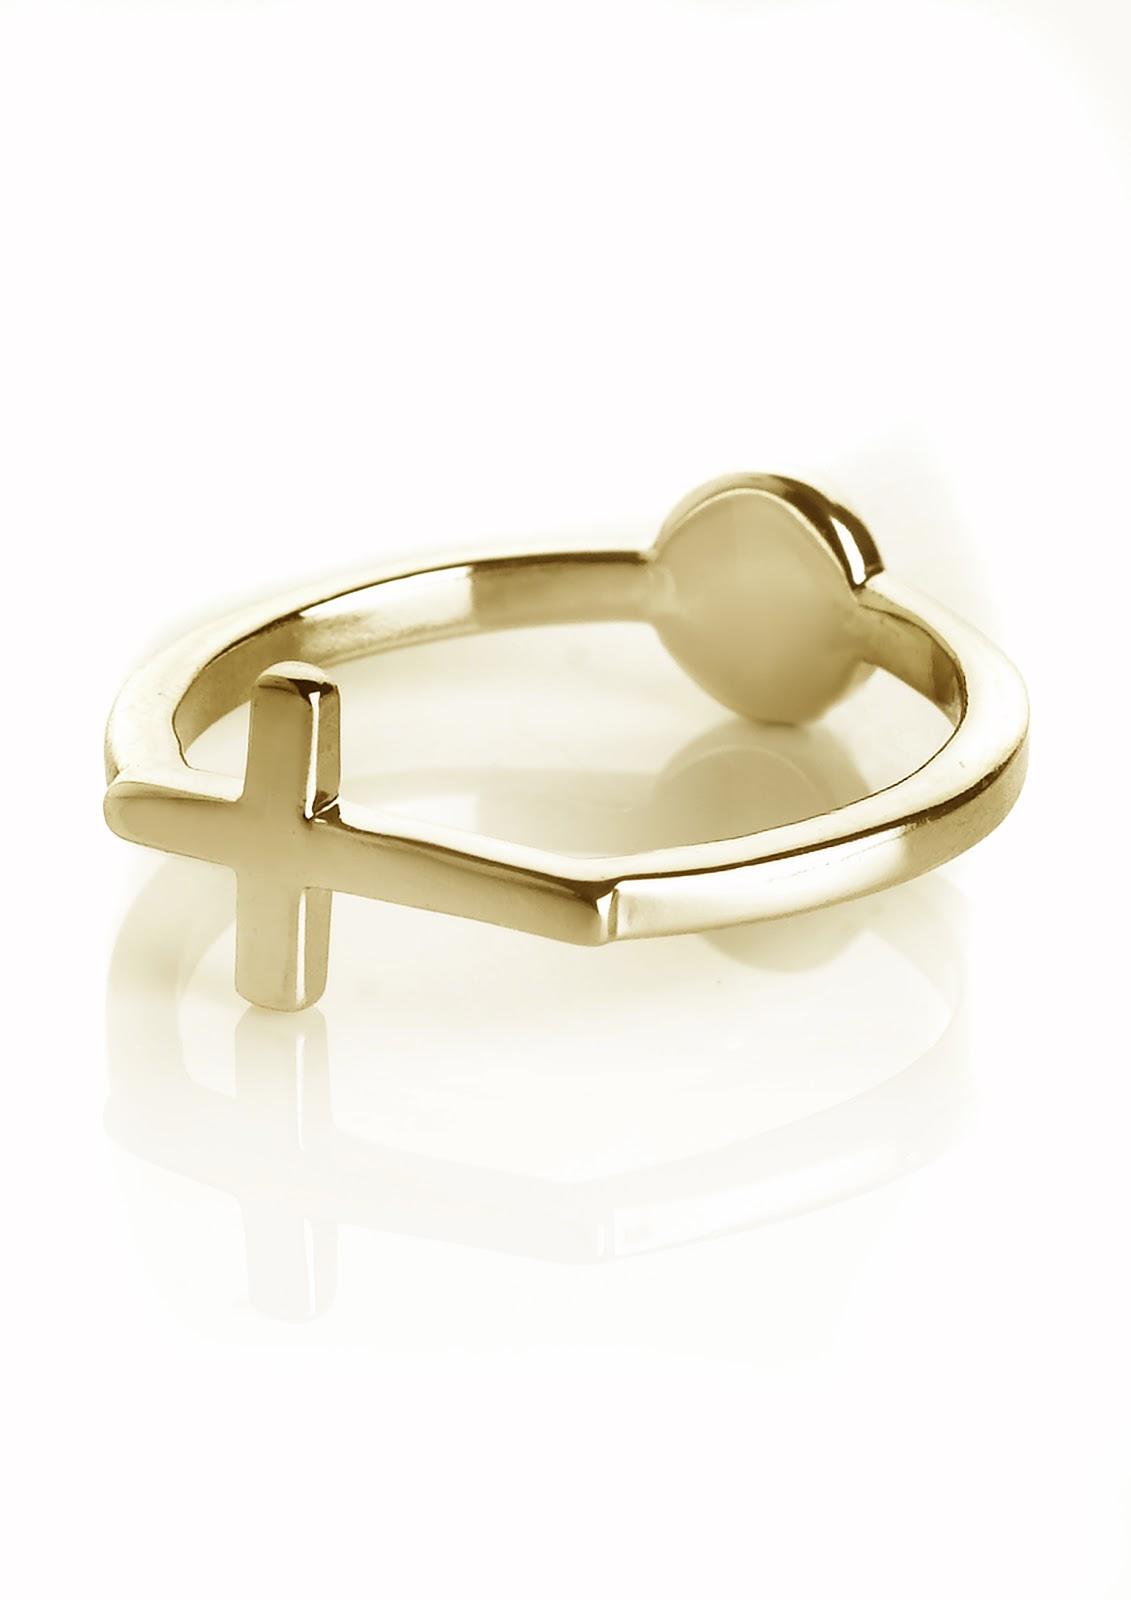 http://2.bp.blogspot.com/-drgx45WUxZ0/UK0NBgjCrgI/AAAAAAAAJFo/7_XdQrCH08A/s1600/Jesus+Loves+U+Ring+-+Gold@Me&Zena.jpg